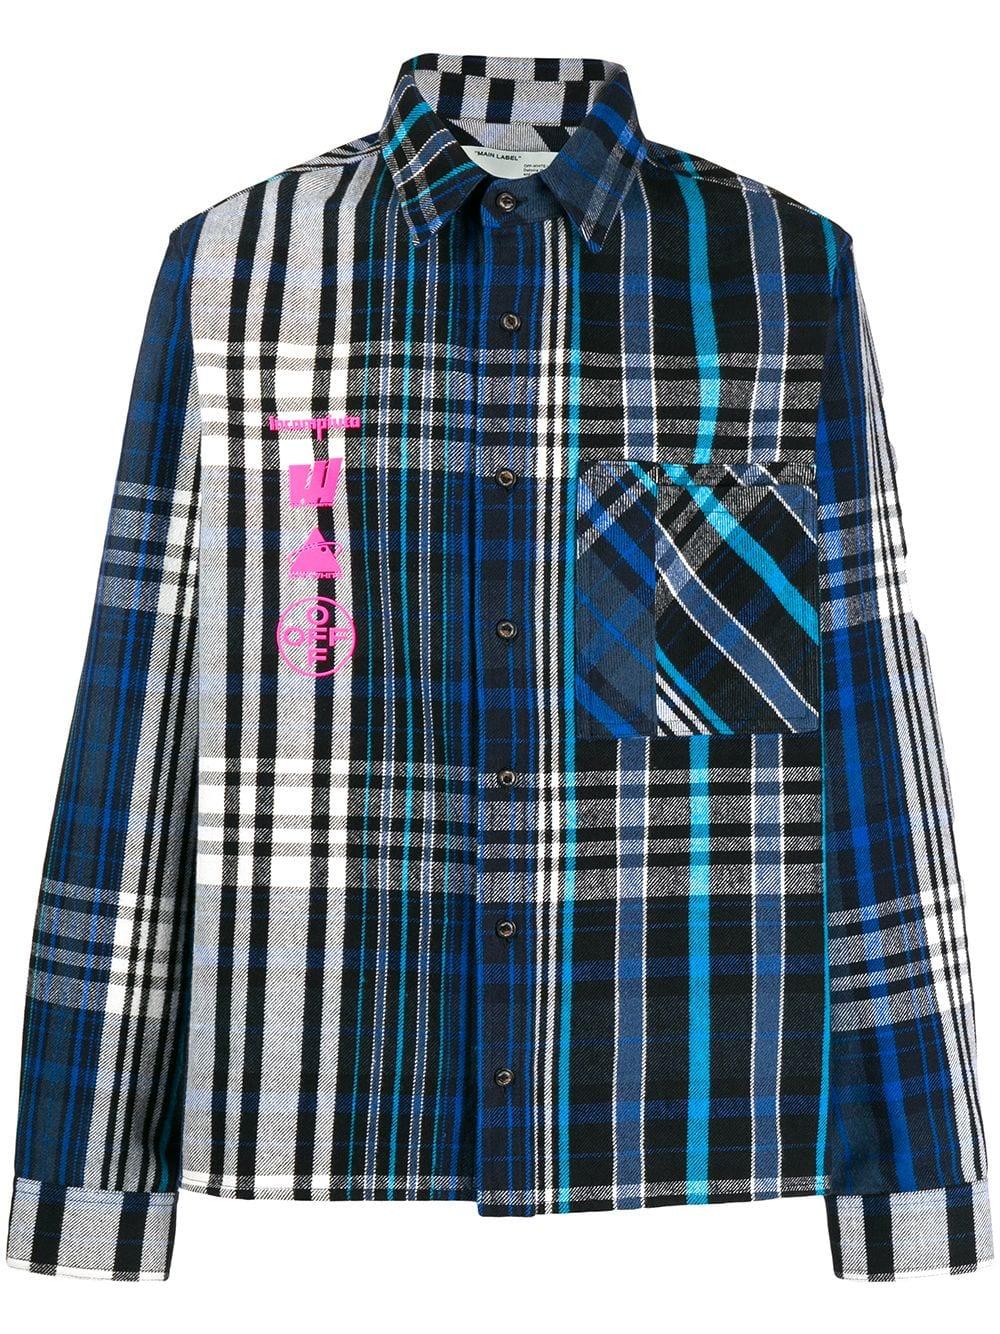 599 0 Off White Tops Printed Shirt Offwhite Tops Clothing Fashion Blue Plaid Shirt Alternative Fashion [ 1334 x 1000 Pixel ]